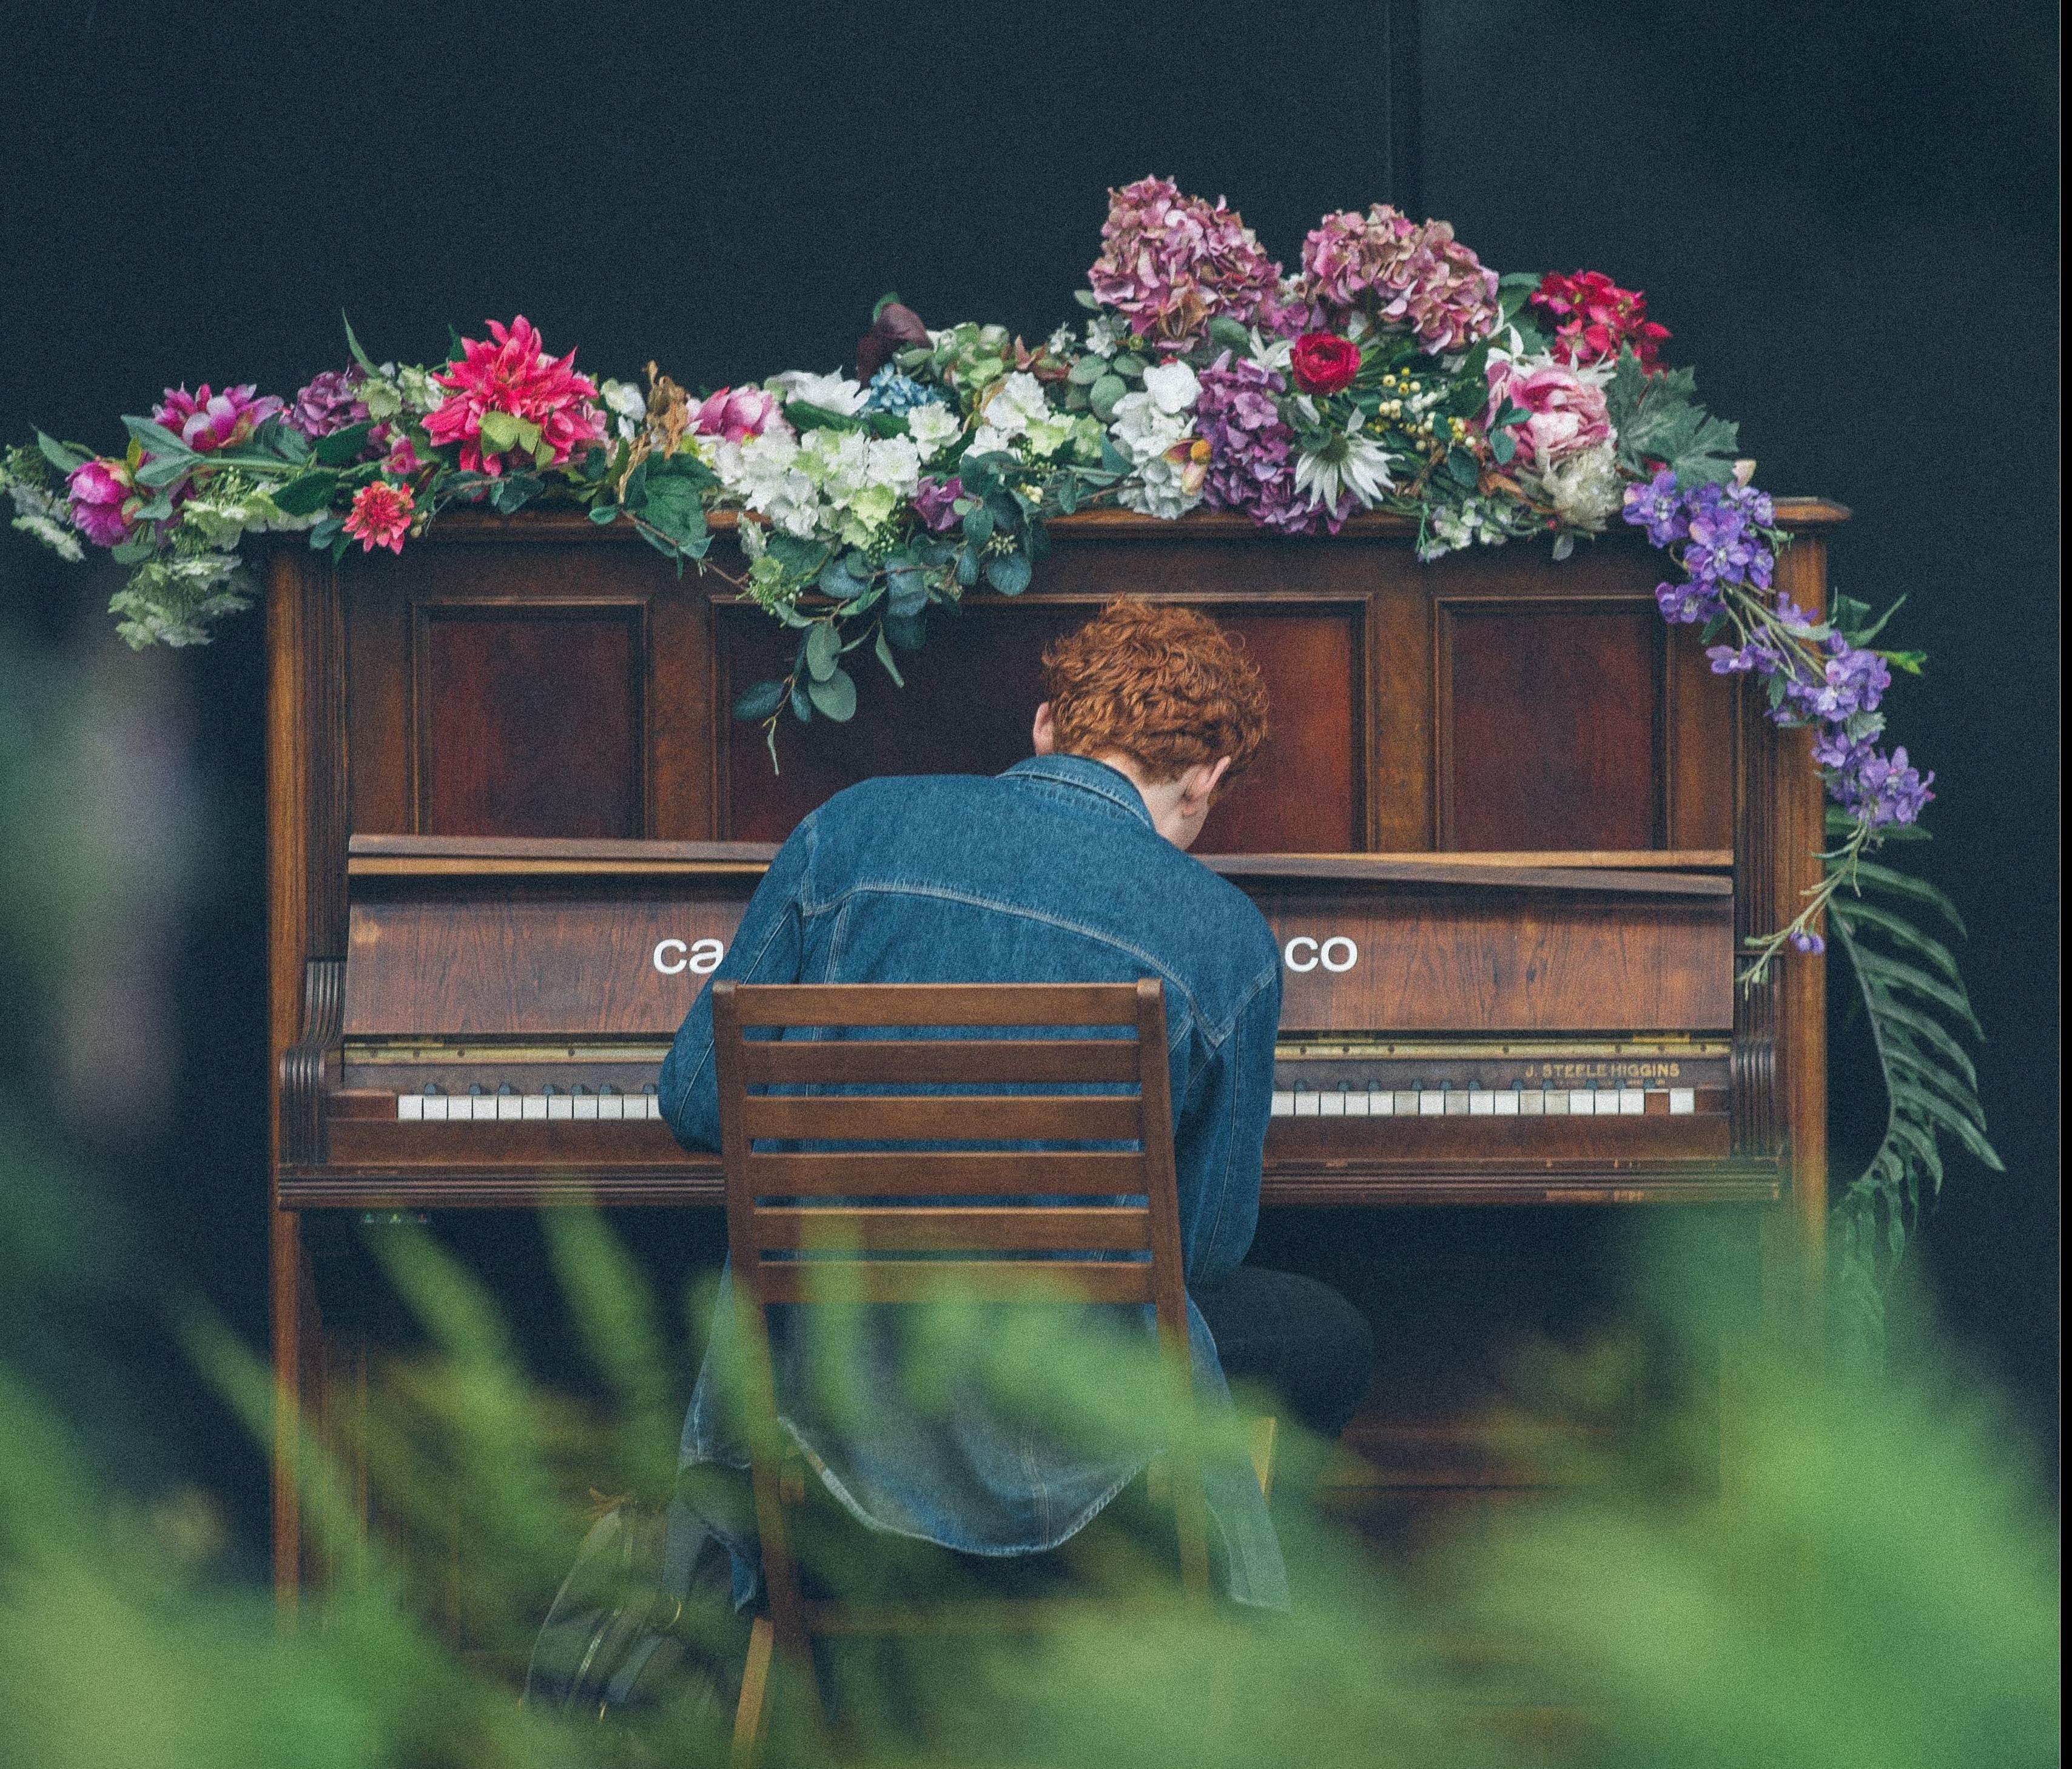 Lördagsmusik - Kleimankvartetten bjuder på Rhenskt